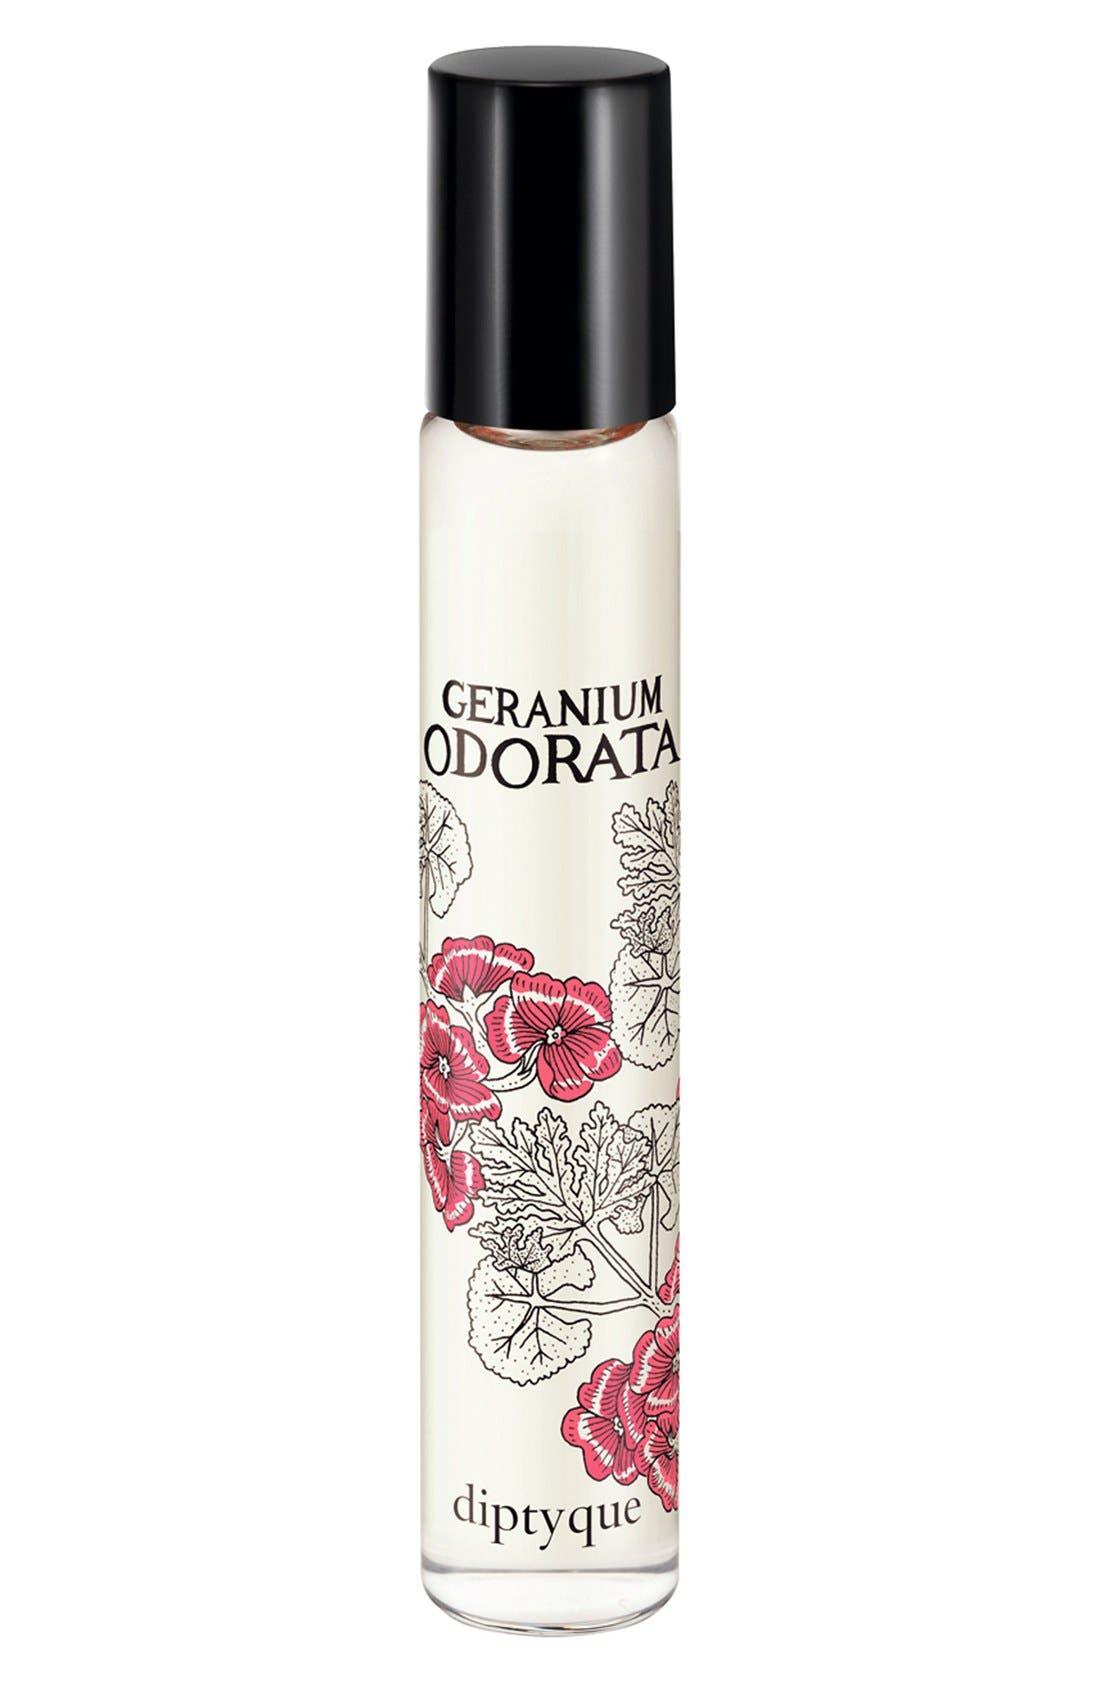 Geranium Odorata Eau de Parfum Rollerball,                             Main thumbnail 1, color,                             000